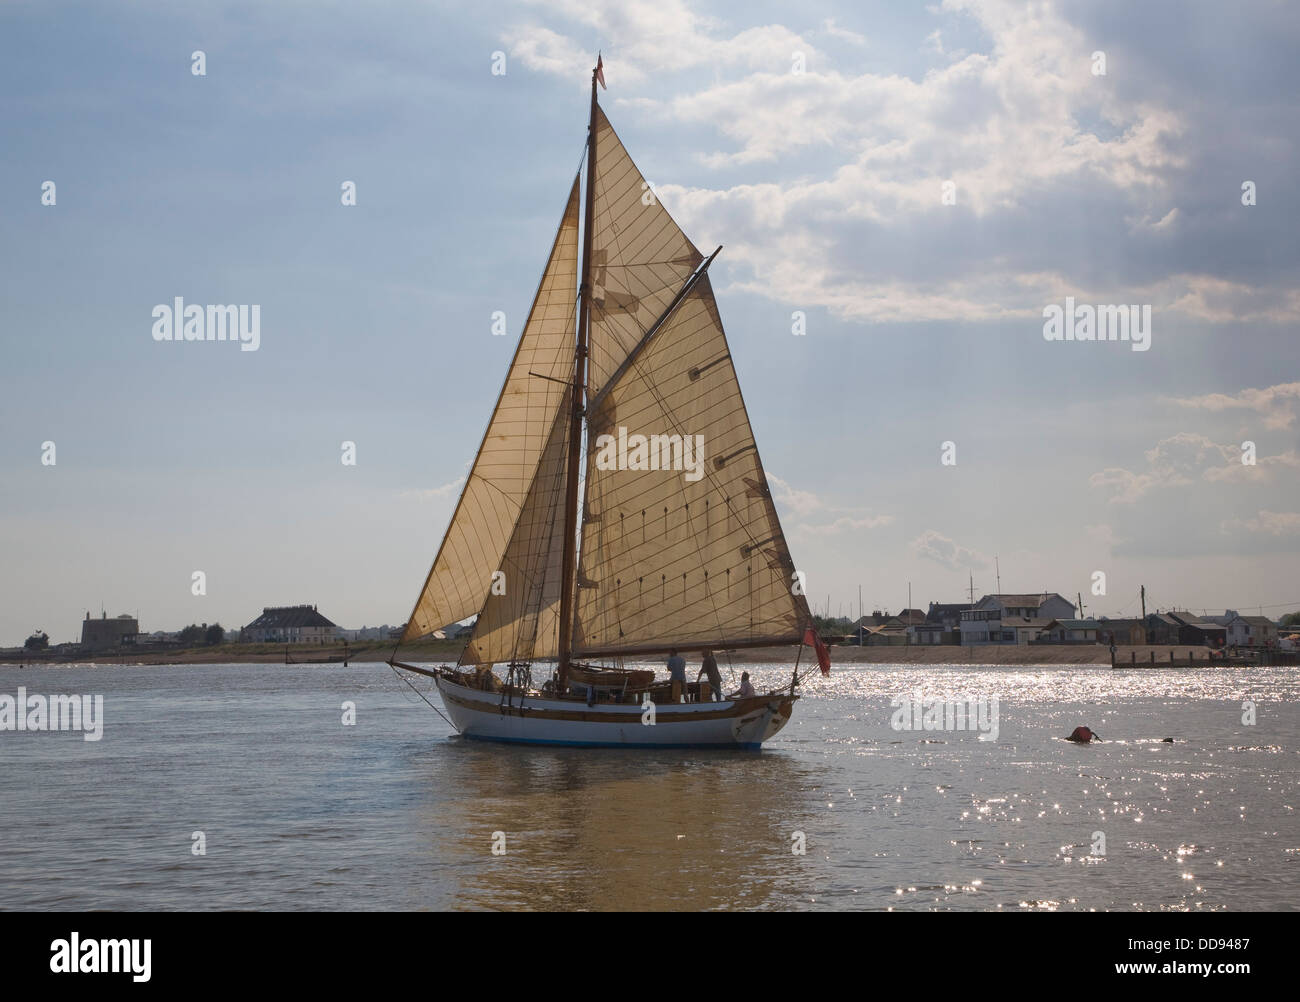 Historic wooden sailing yacht boat full sail River Deben mouth Bawdsey Quay Suffolk England - Stock Image